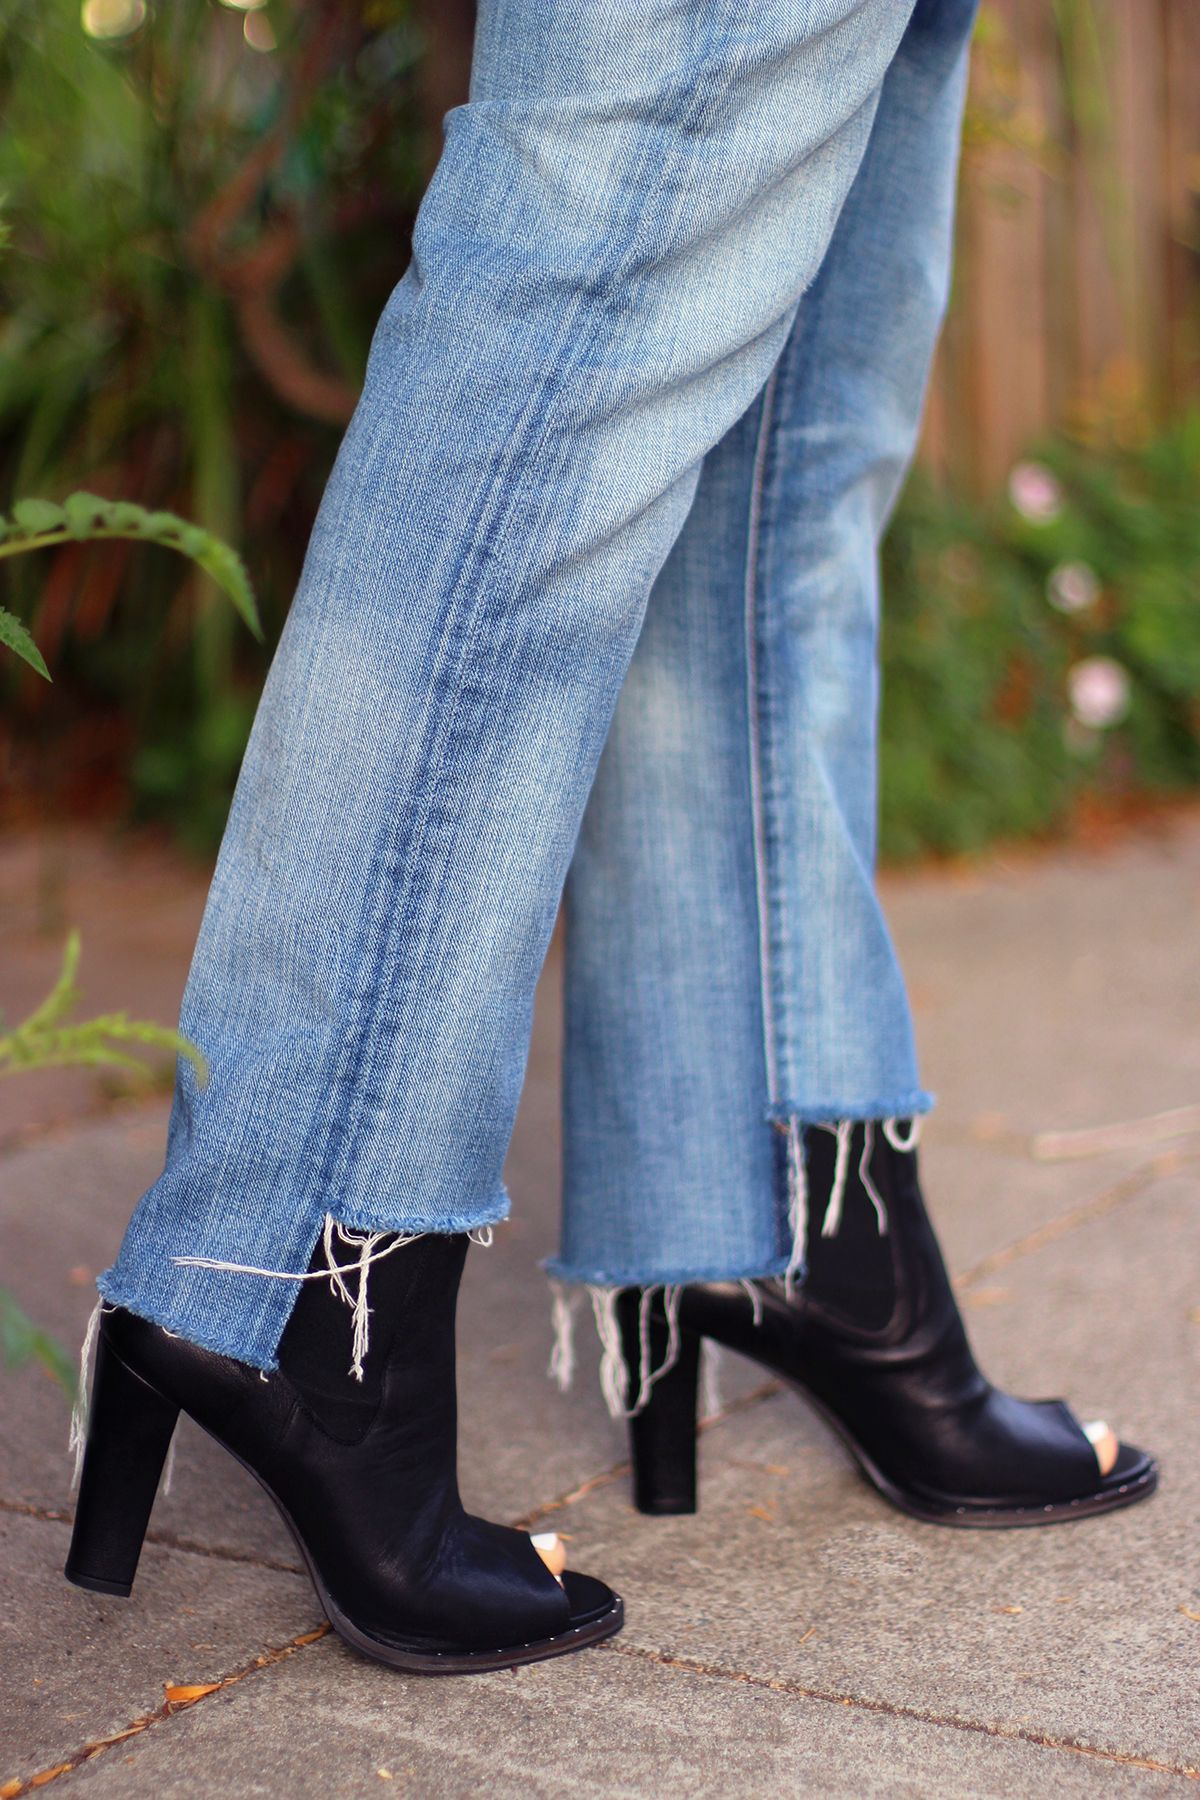 Tipsdiy Fashion tutorial ankle wrap pumps best photo